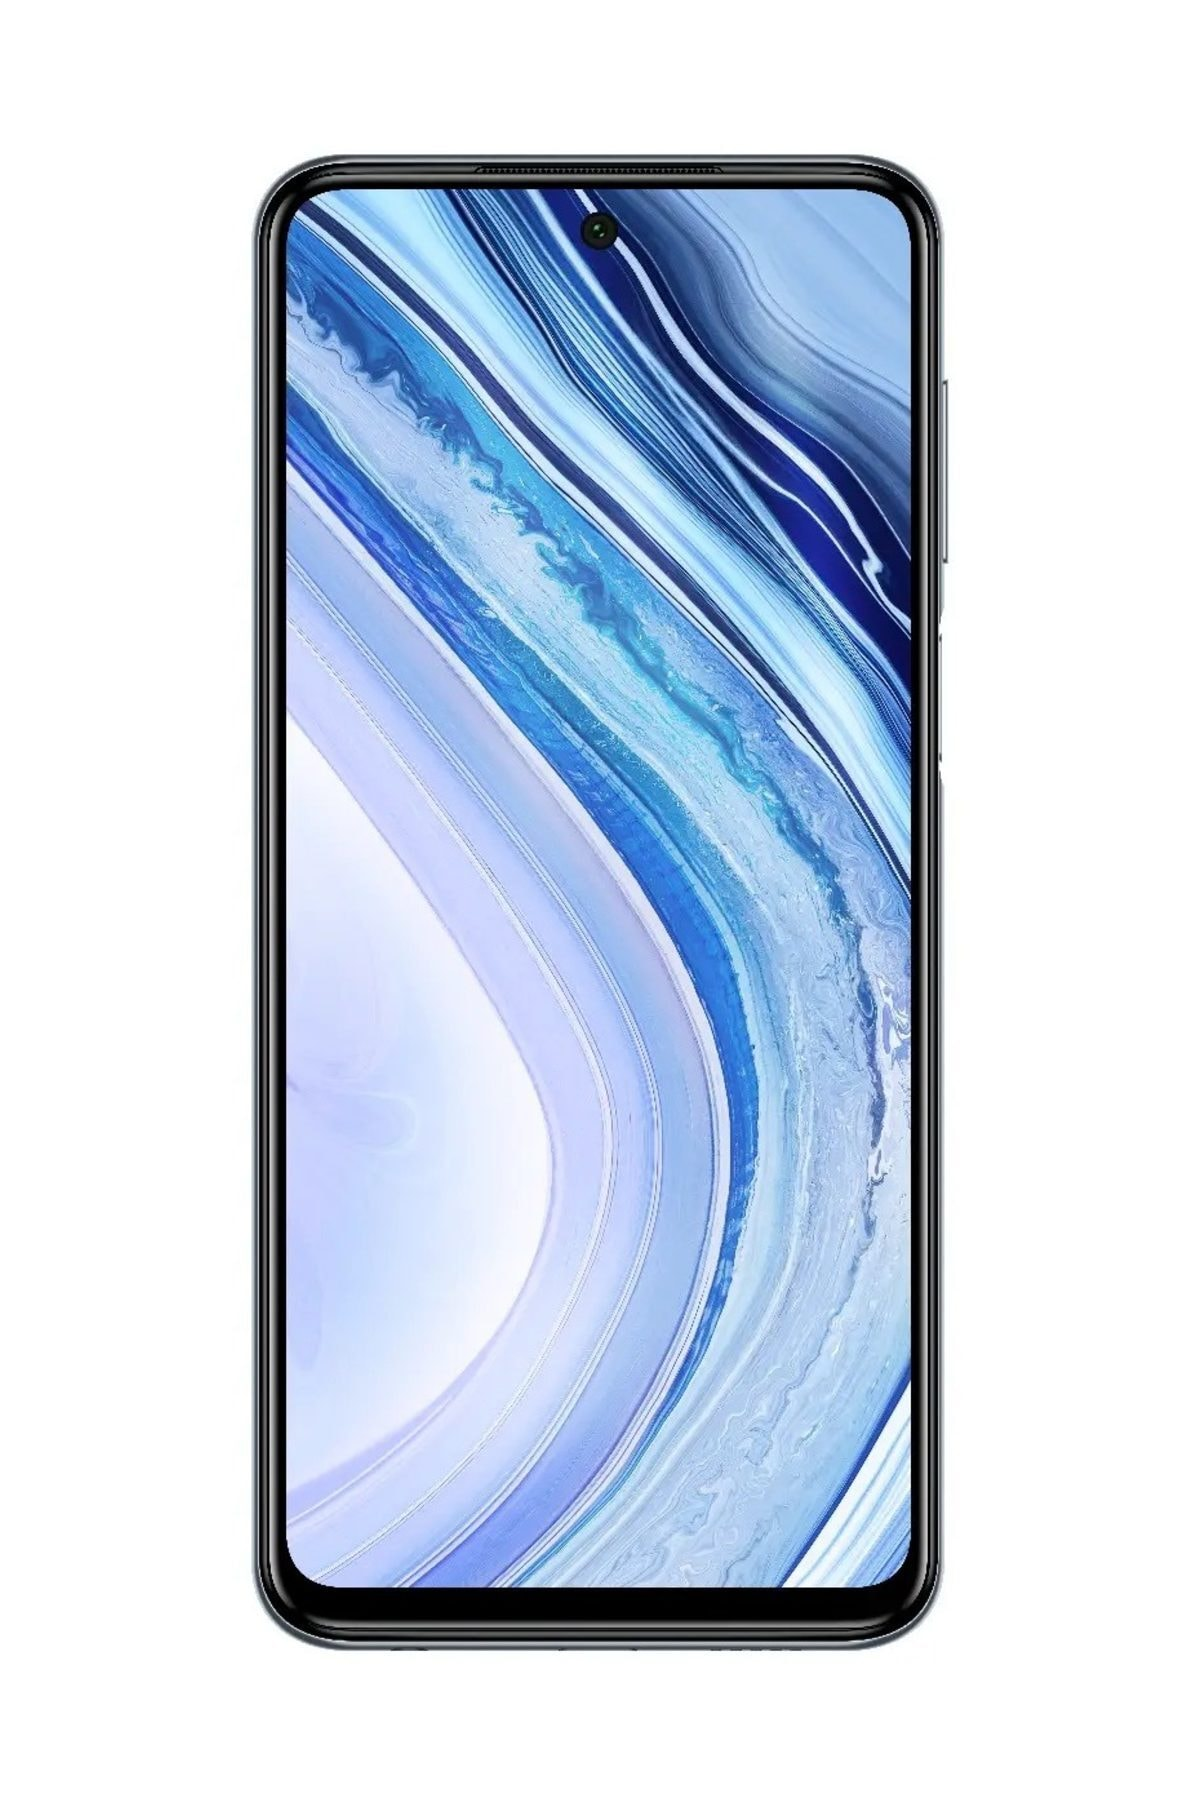 Xiaomi Redmi Note 9 Pro 128GB Gri Cep Telefonu (Xiaomi Türkiye Garantiili) 1